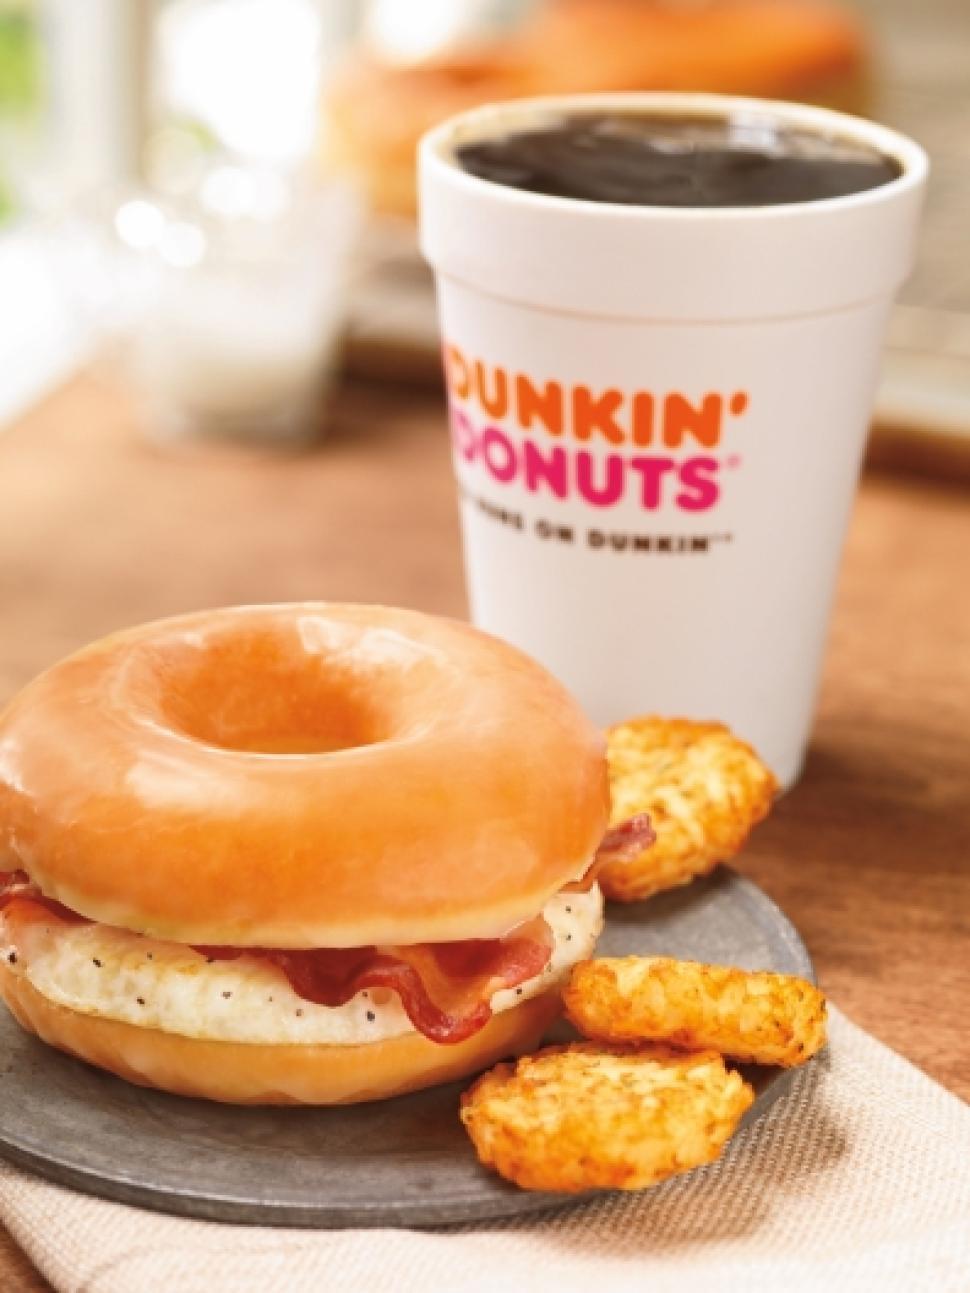 Dunkin Donuts Healthy Breakfast  Dunkin Donuts adding bacon doughnut breakfast sandwich to